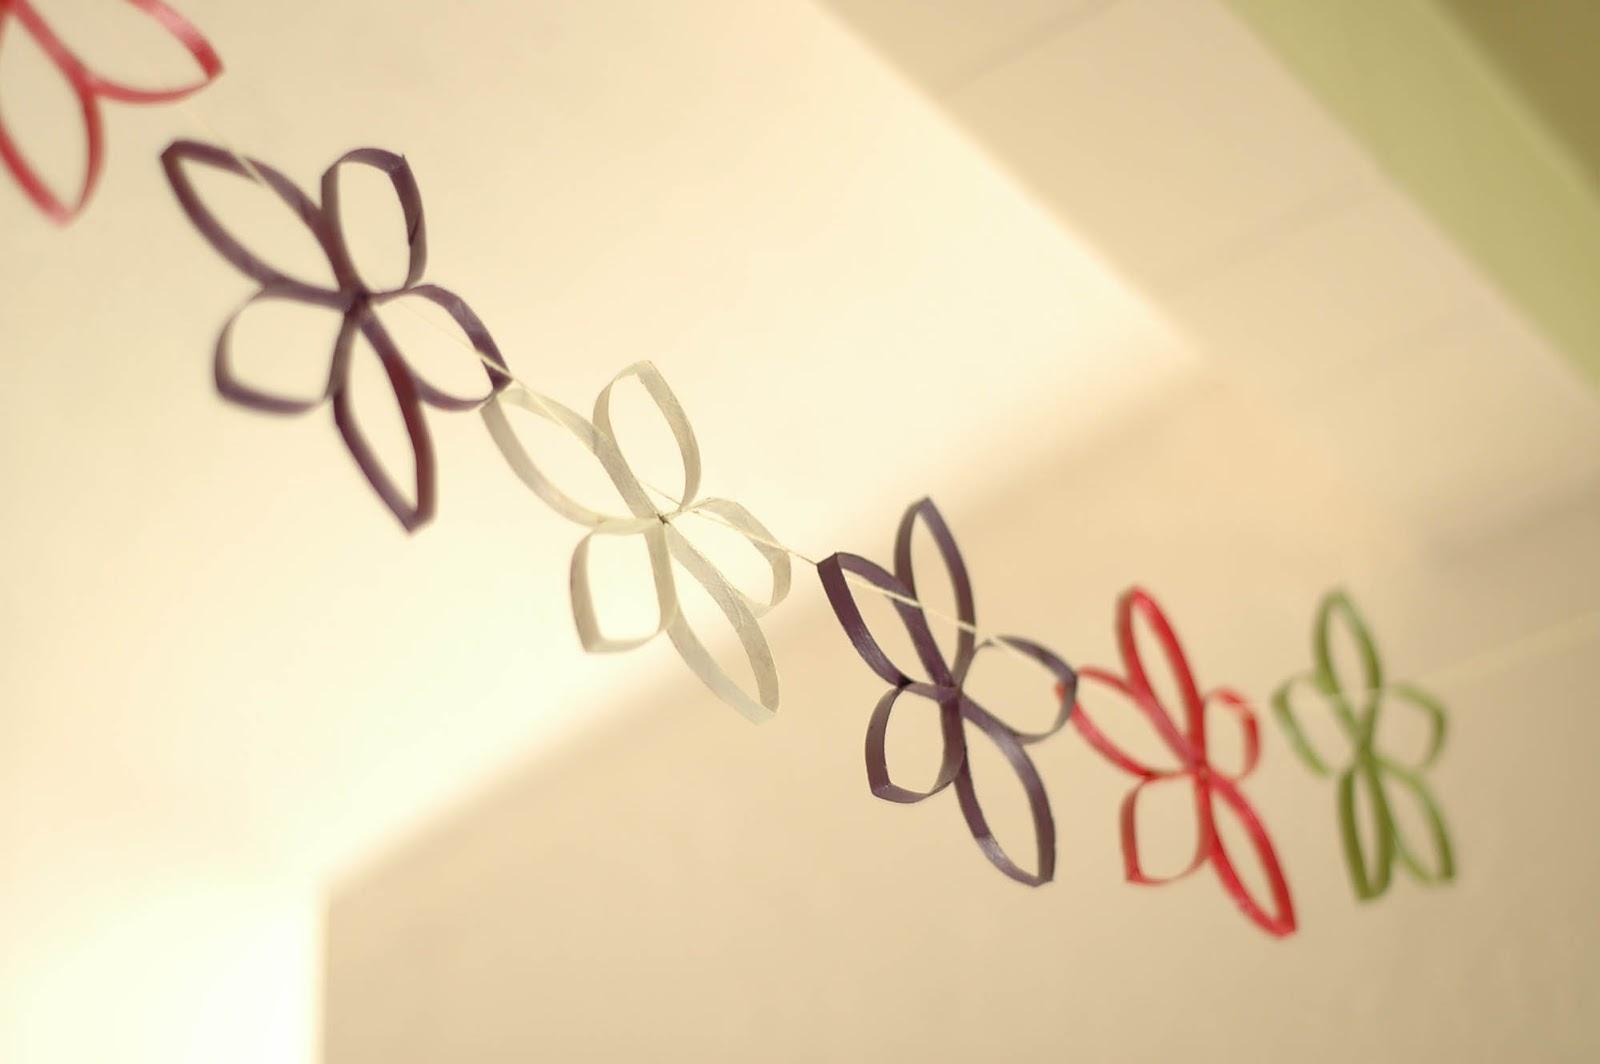 Crafting Made Easy: Cardboard Flower Decorations